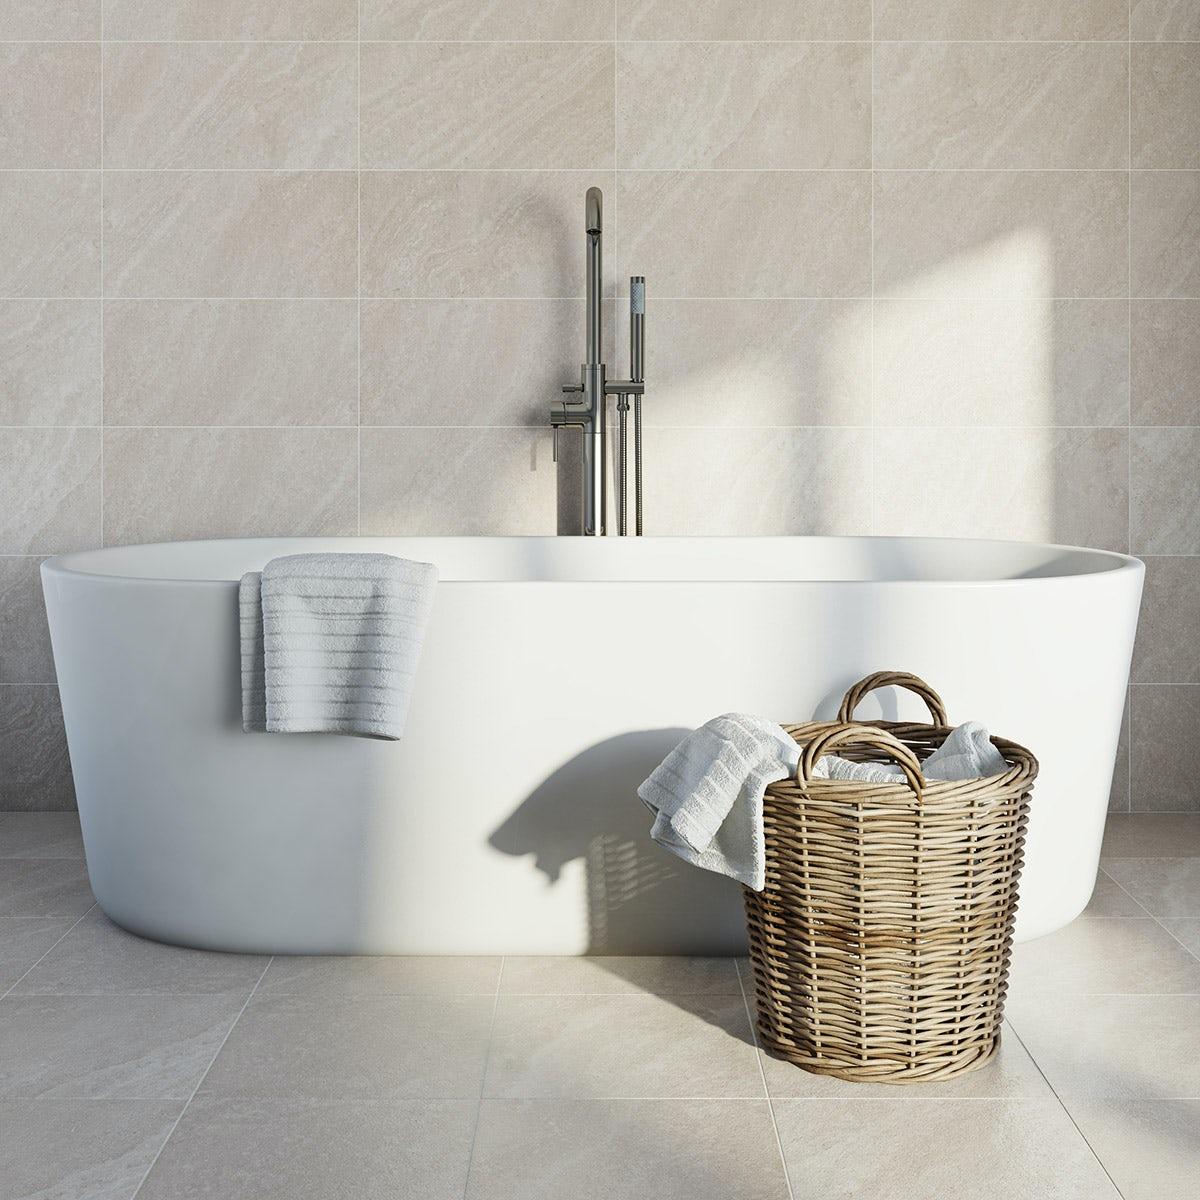 British Ceramics Tile Pumice grey matt tile 248mm x 498mm